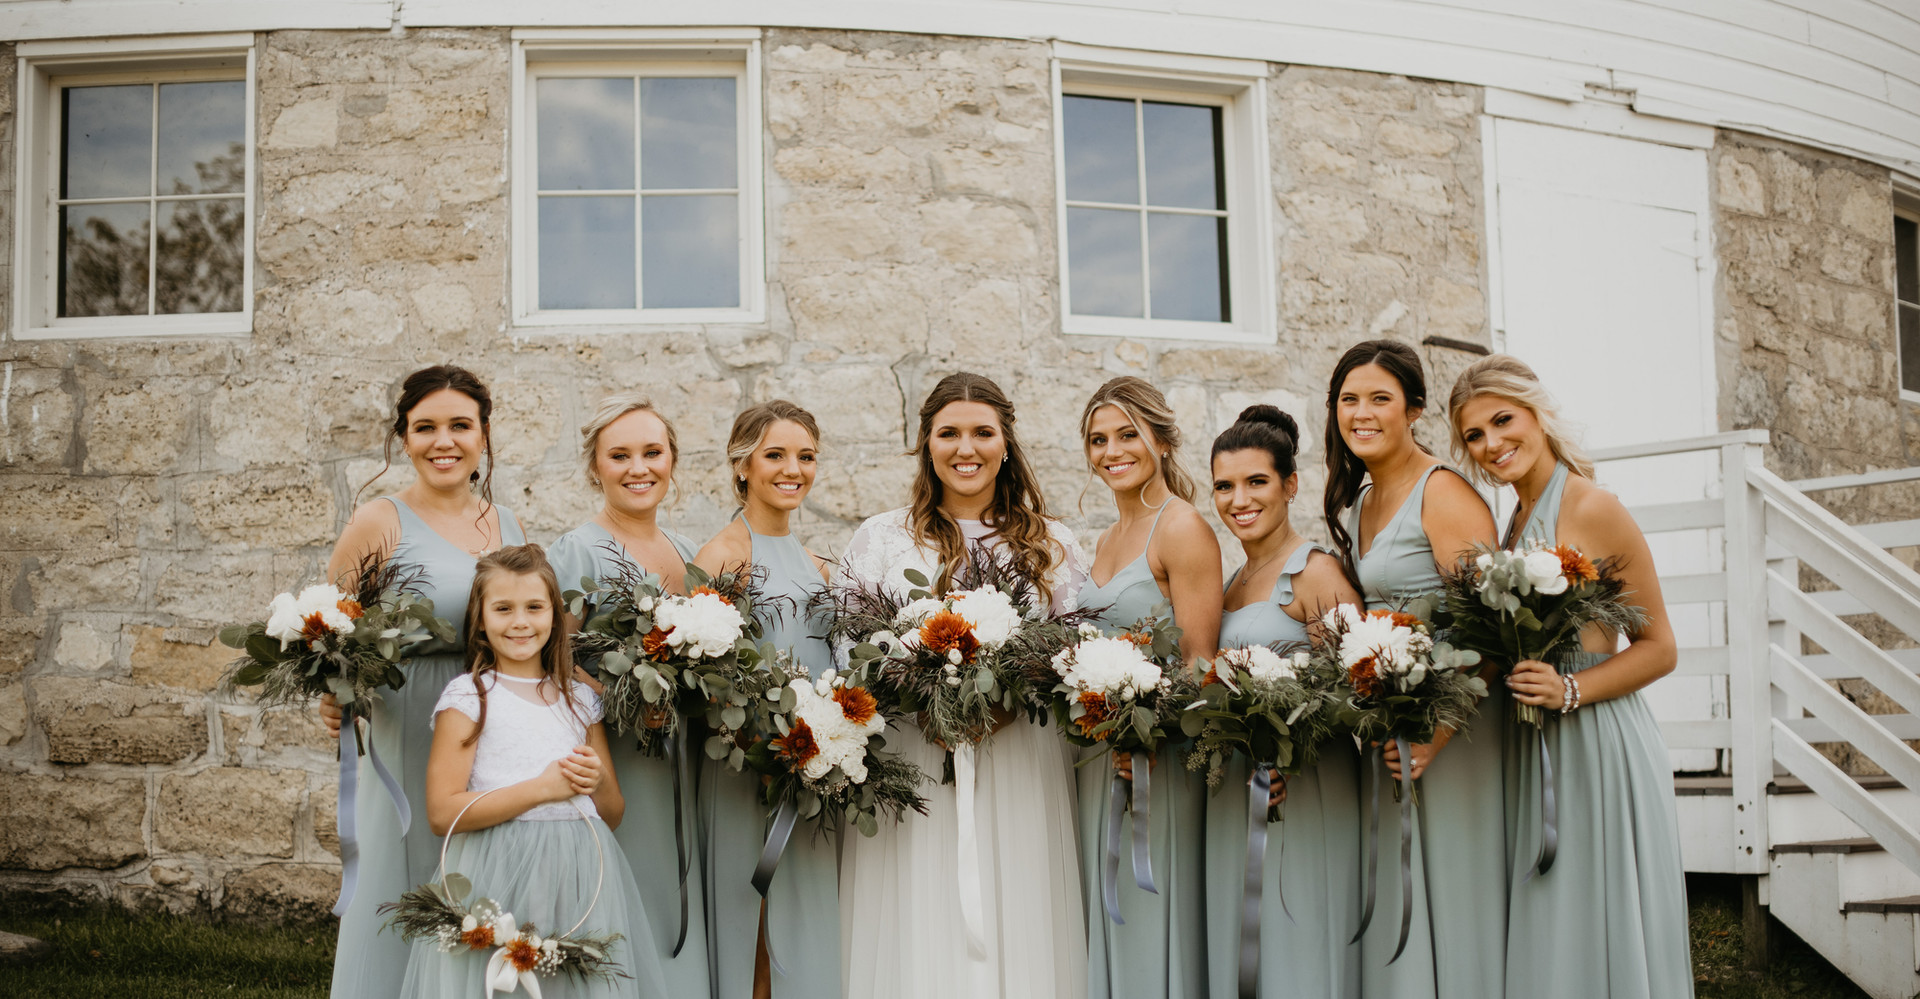 Lydia & her girls